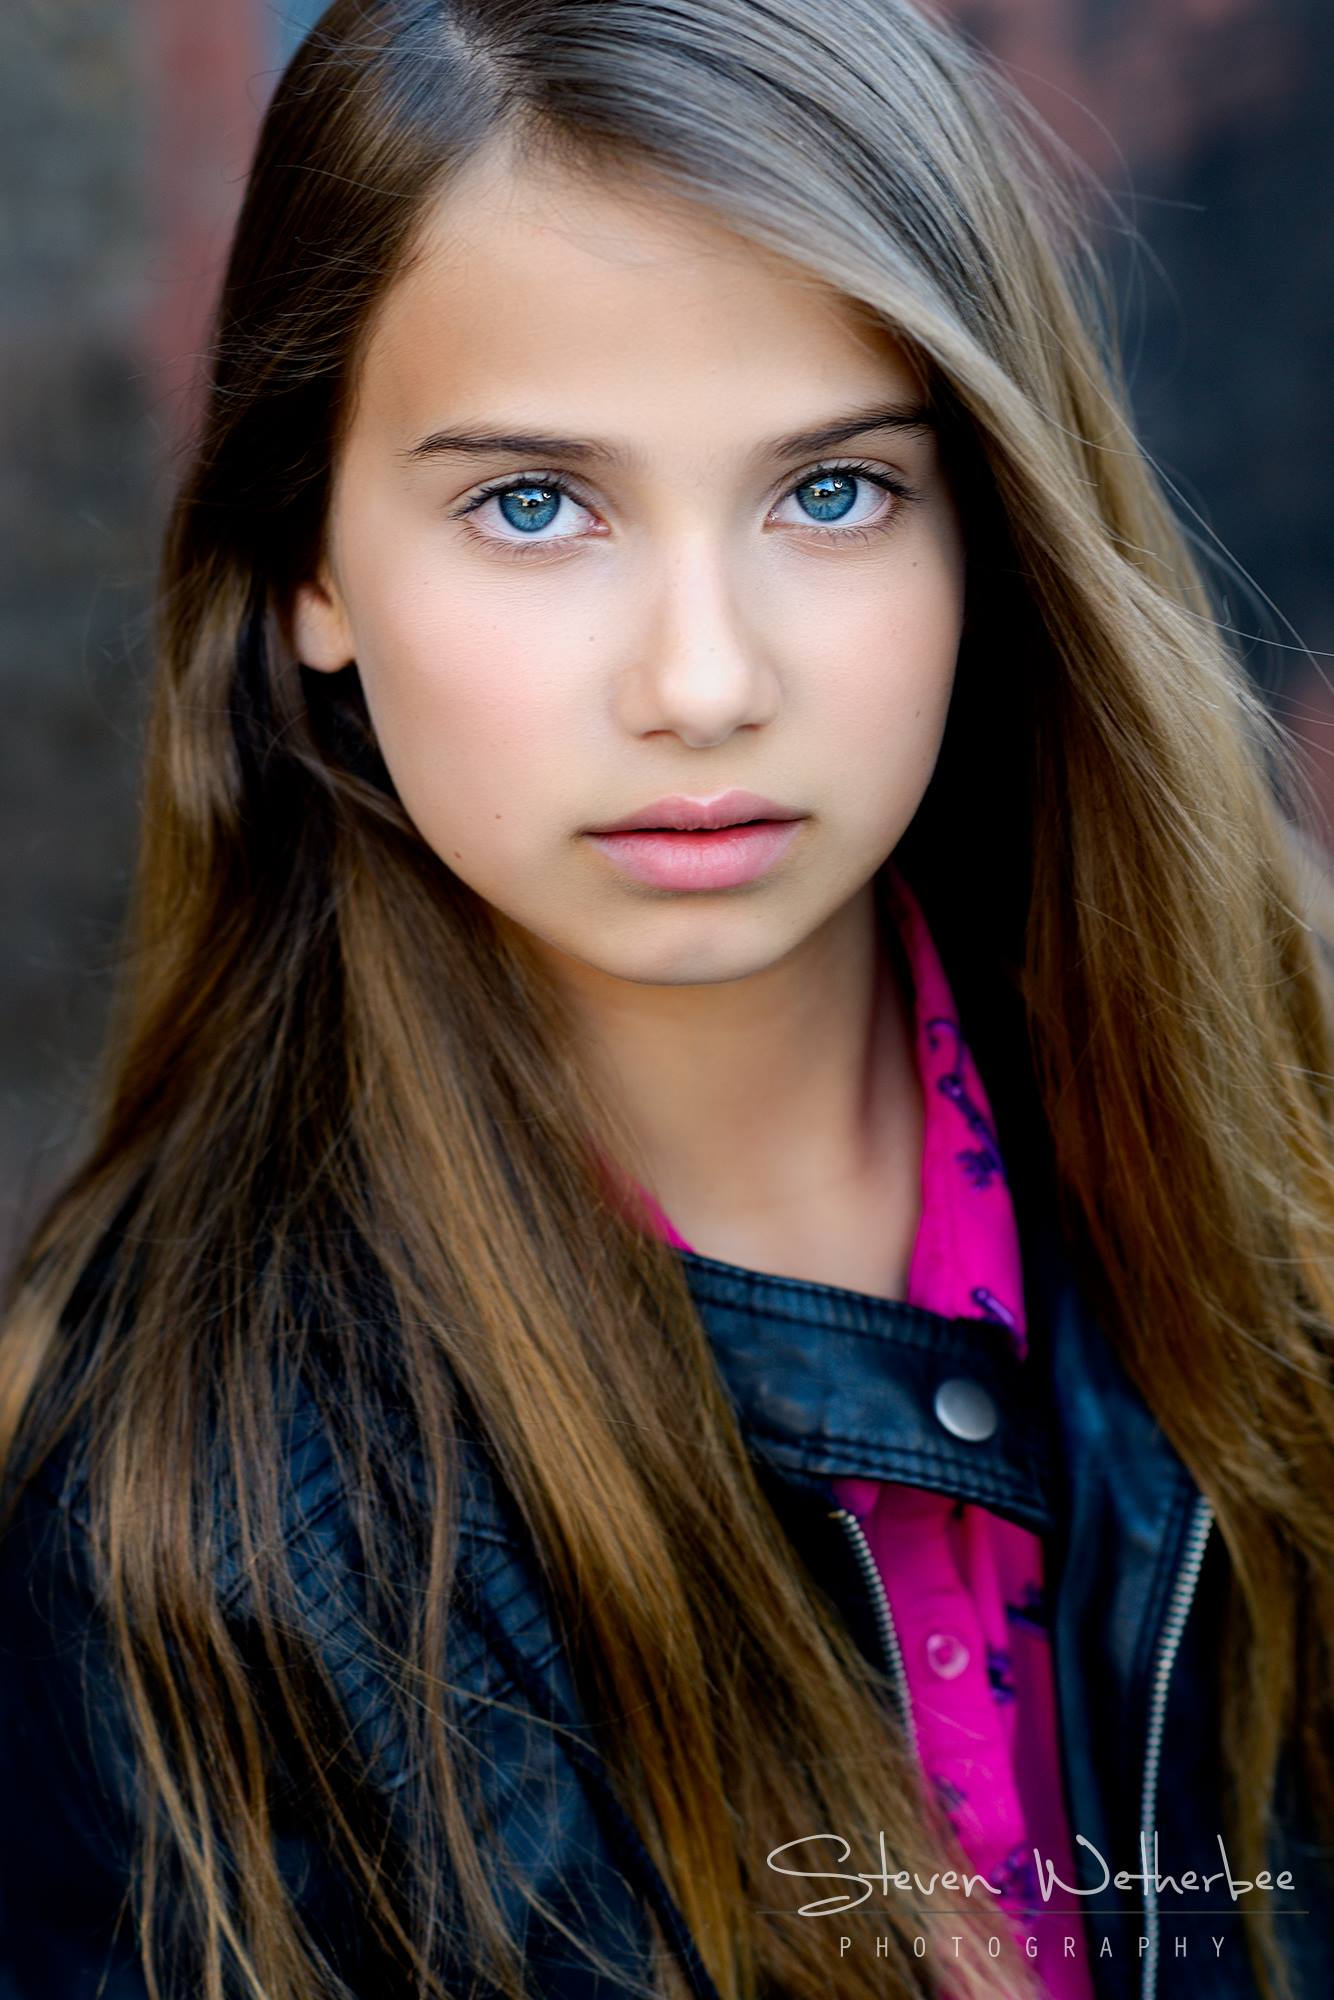 Makeup and Hair for Actress Headshots